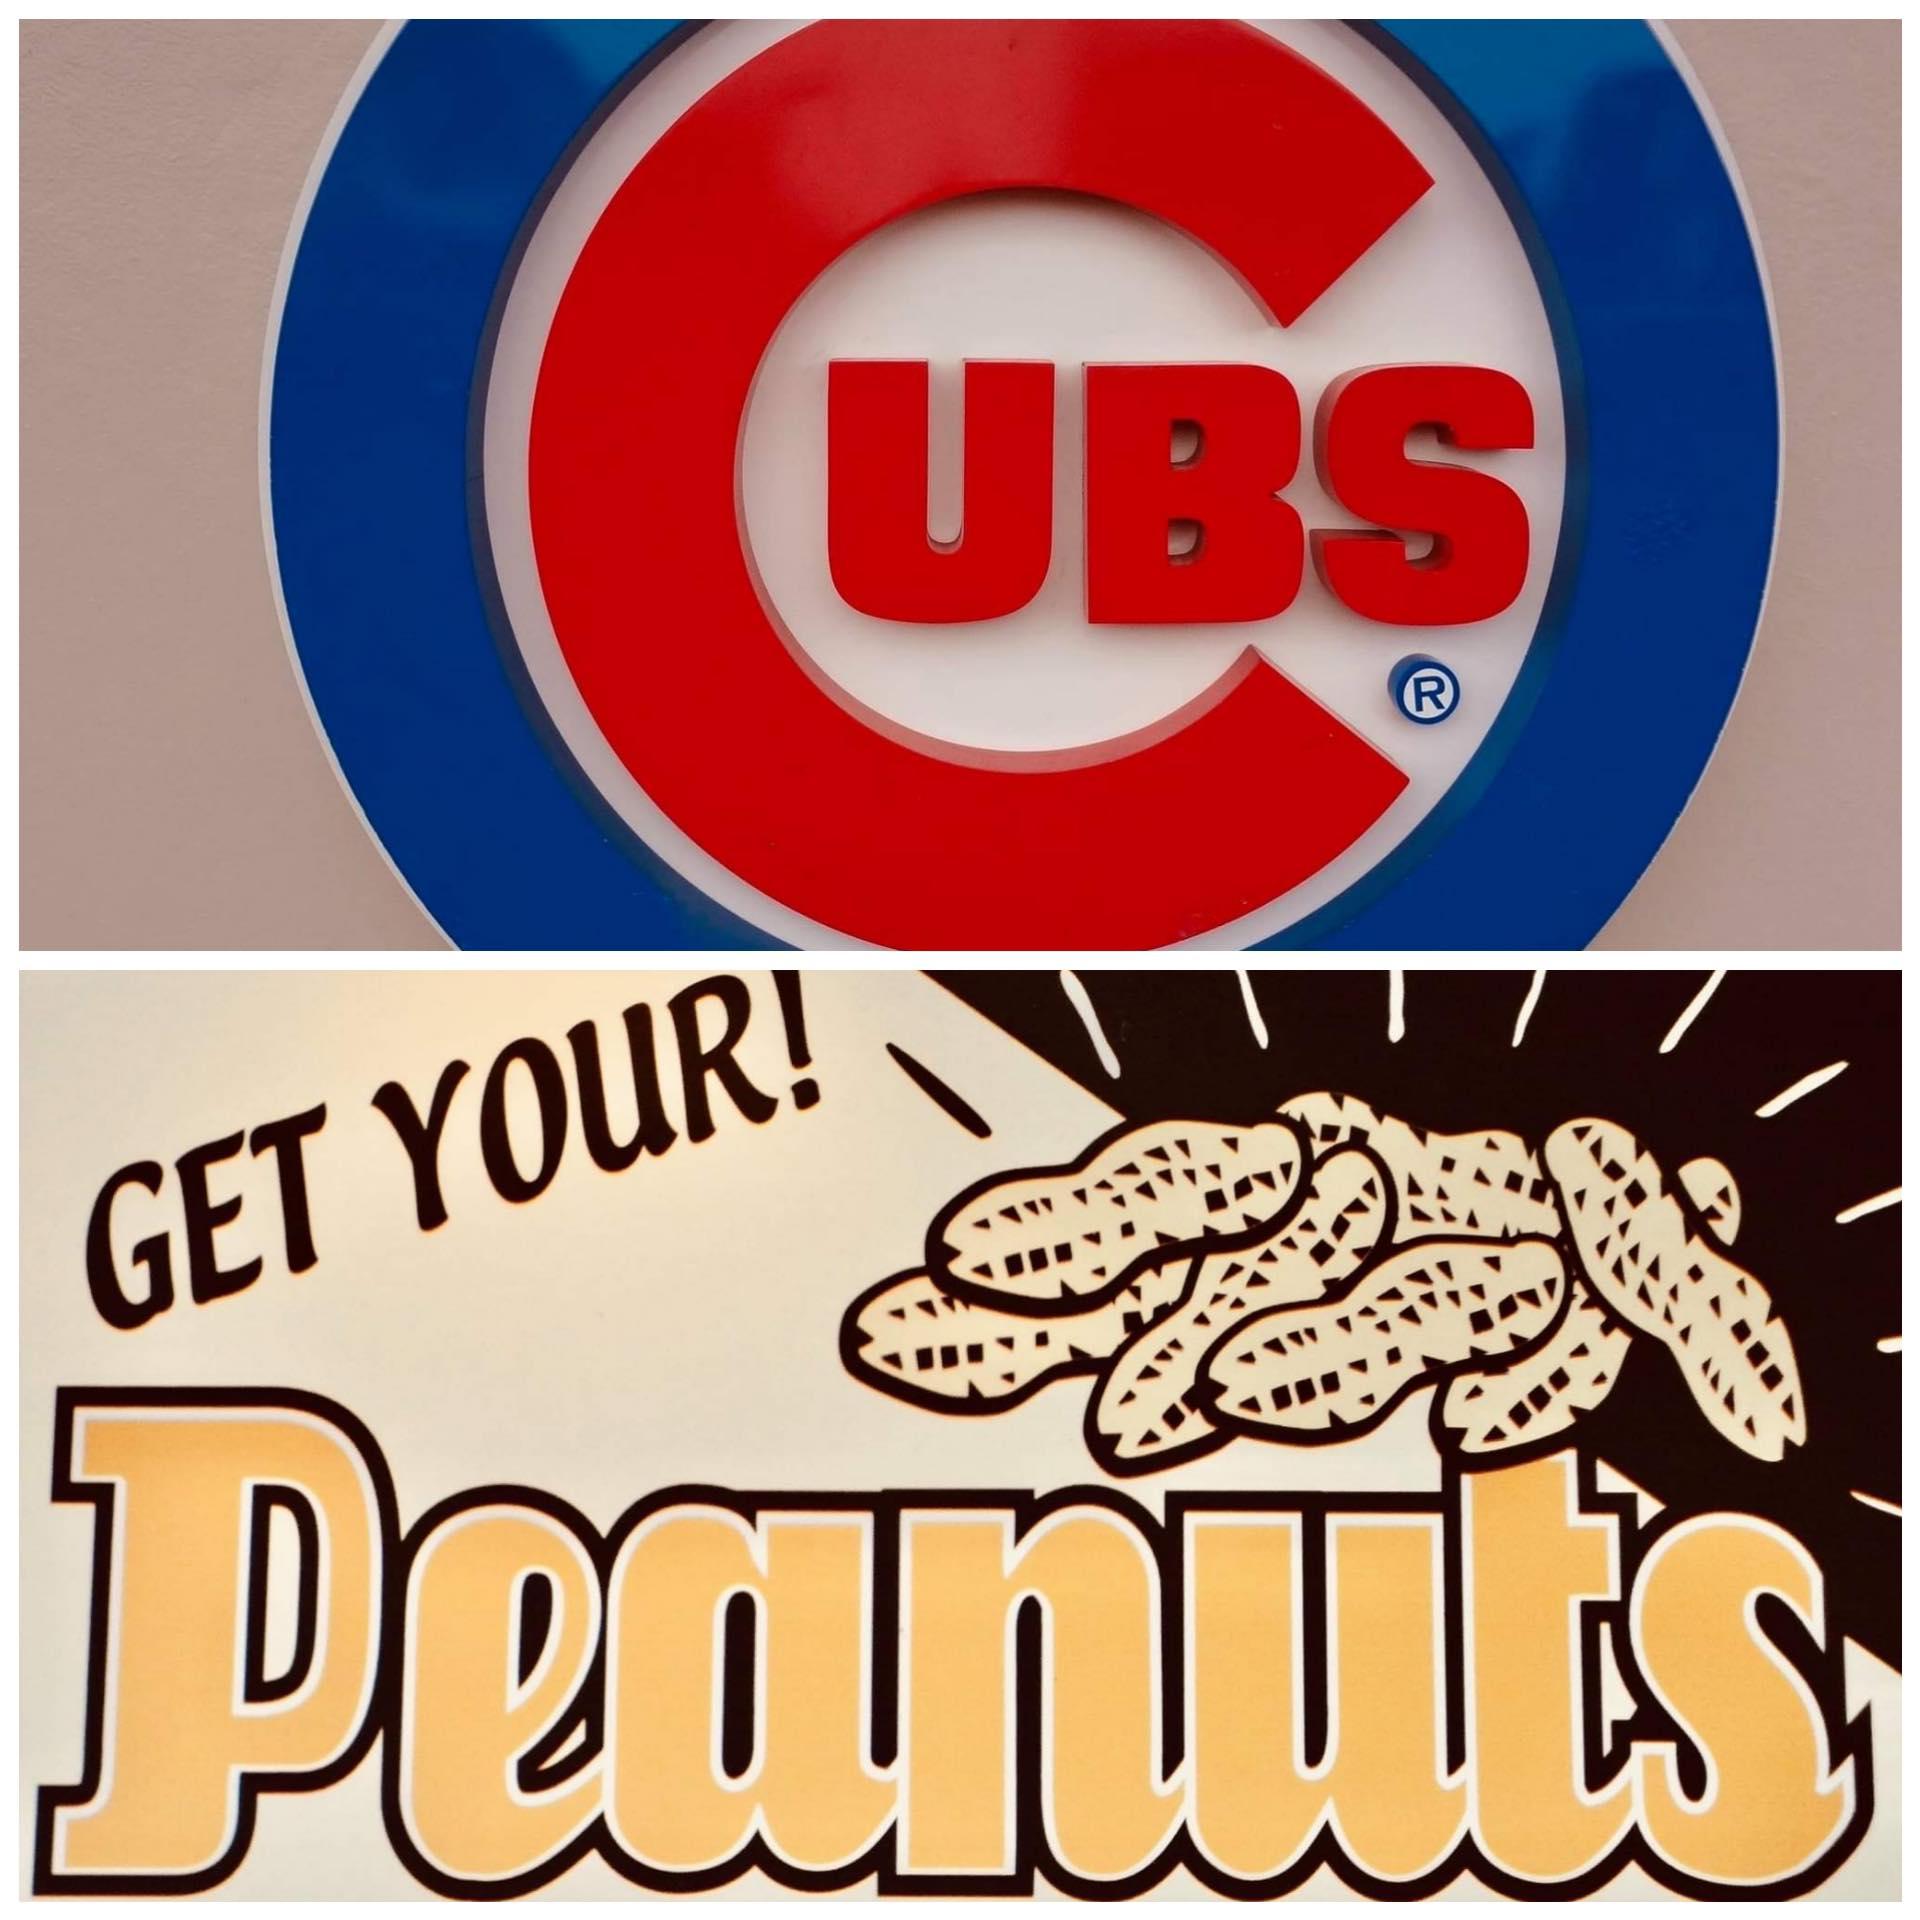 Chicago Nostalgia The Cubs.